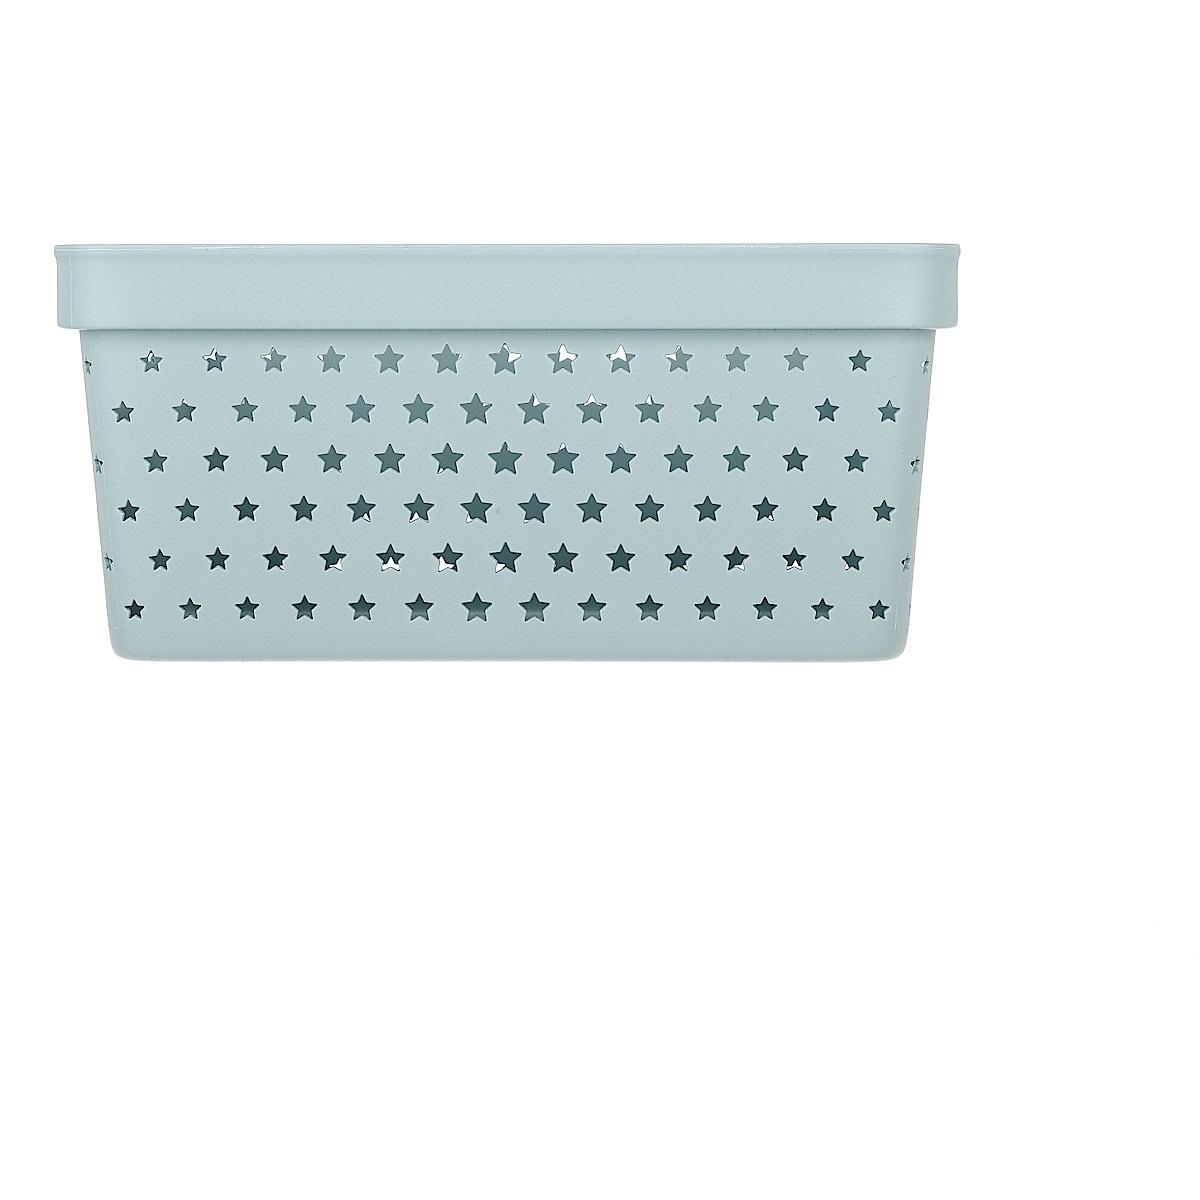 Star Storage Basket, 4.5L